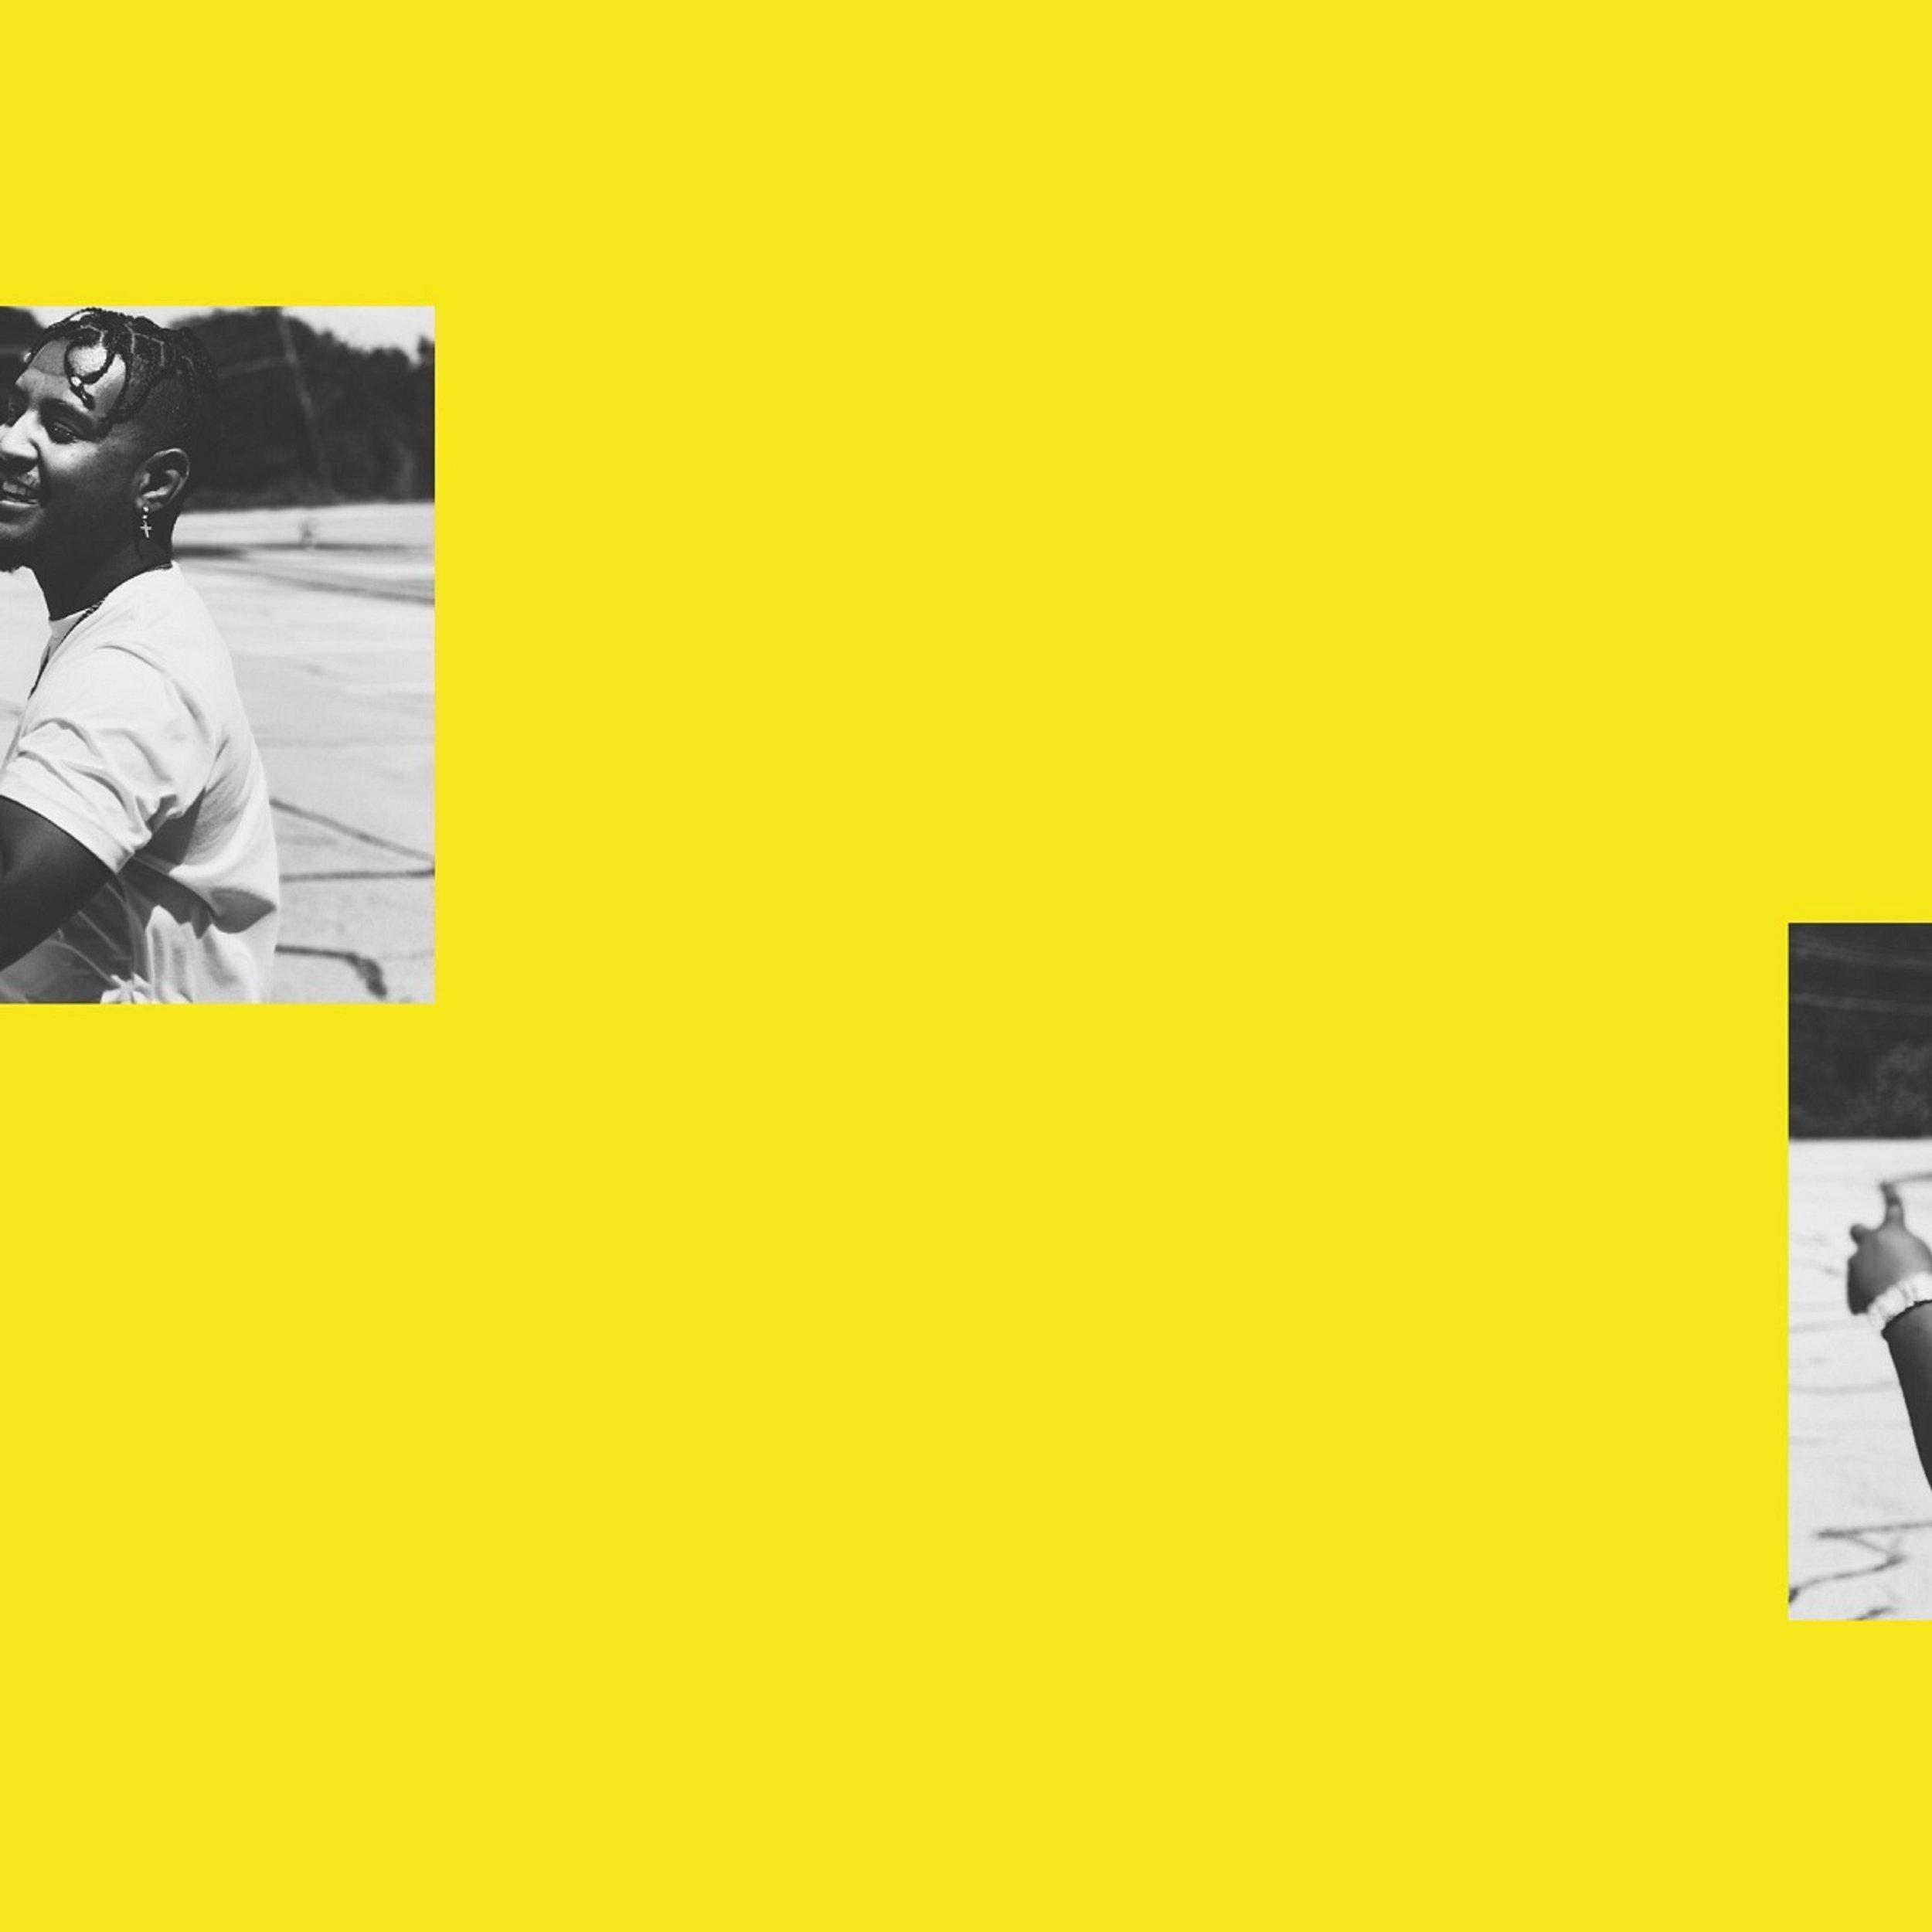 91 Thompson - Hip Hop / R&B / POP